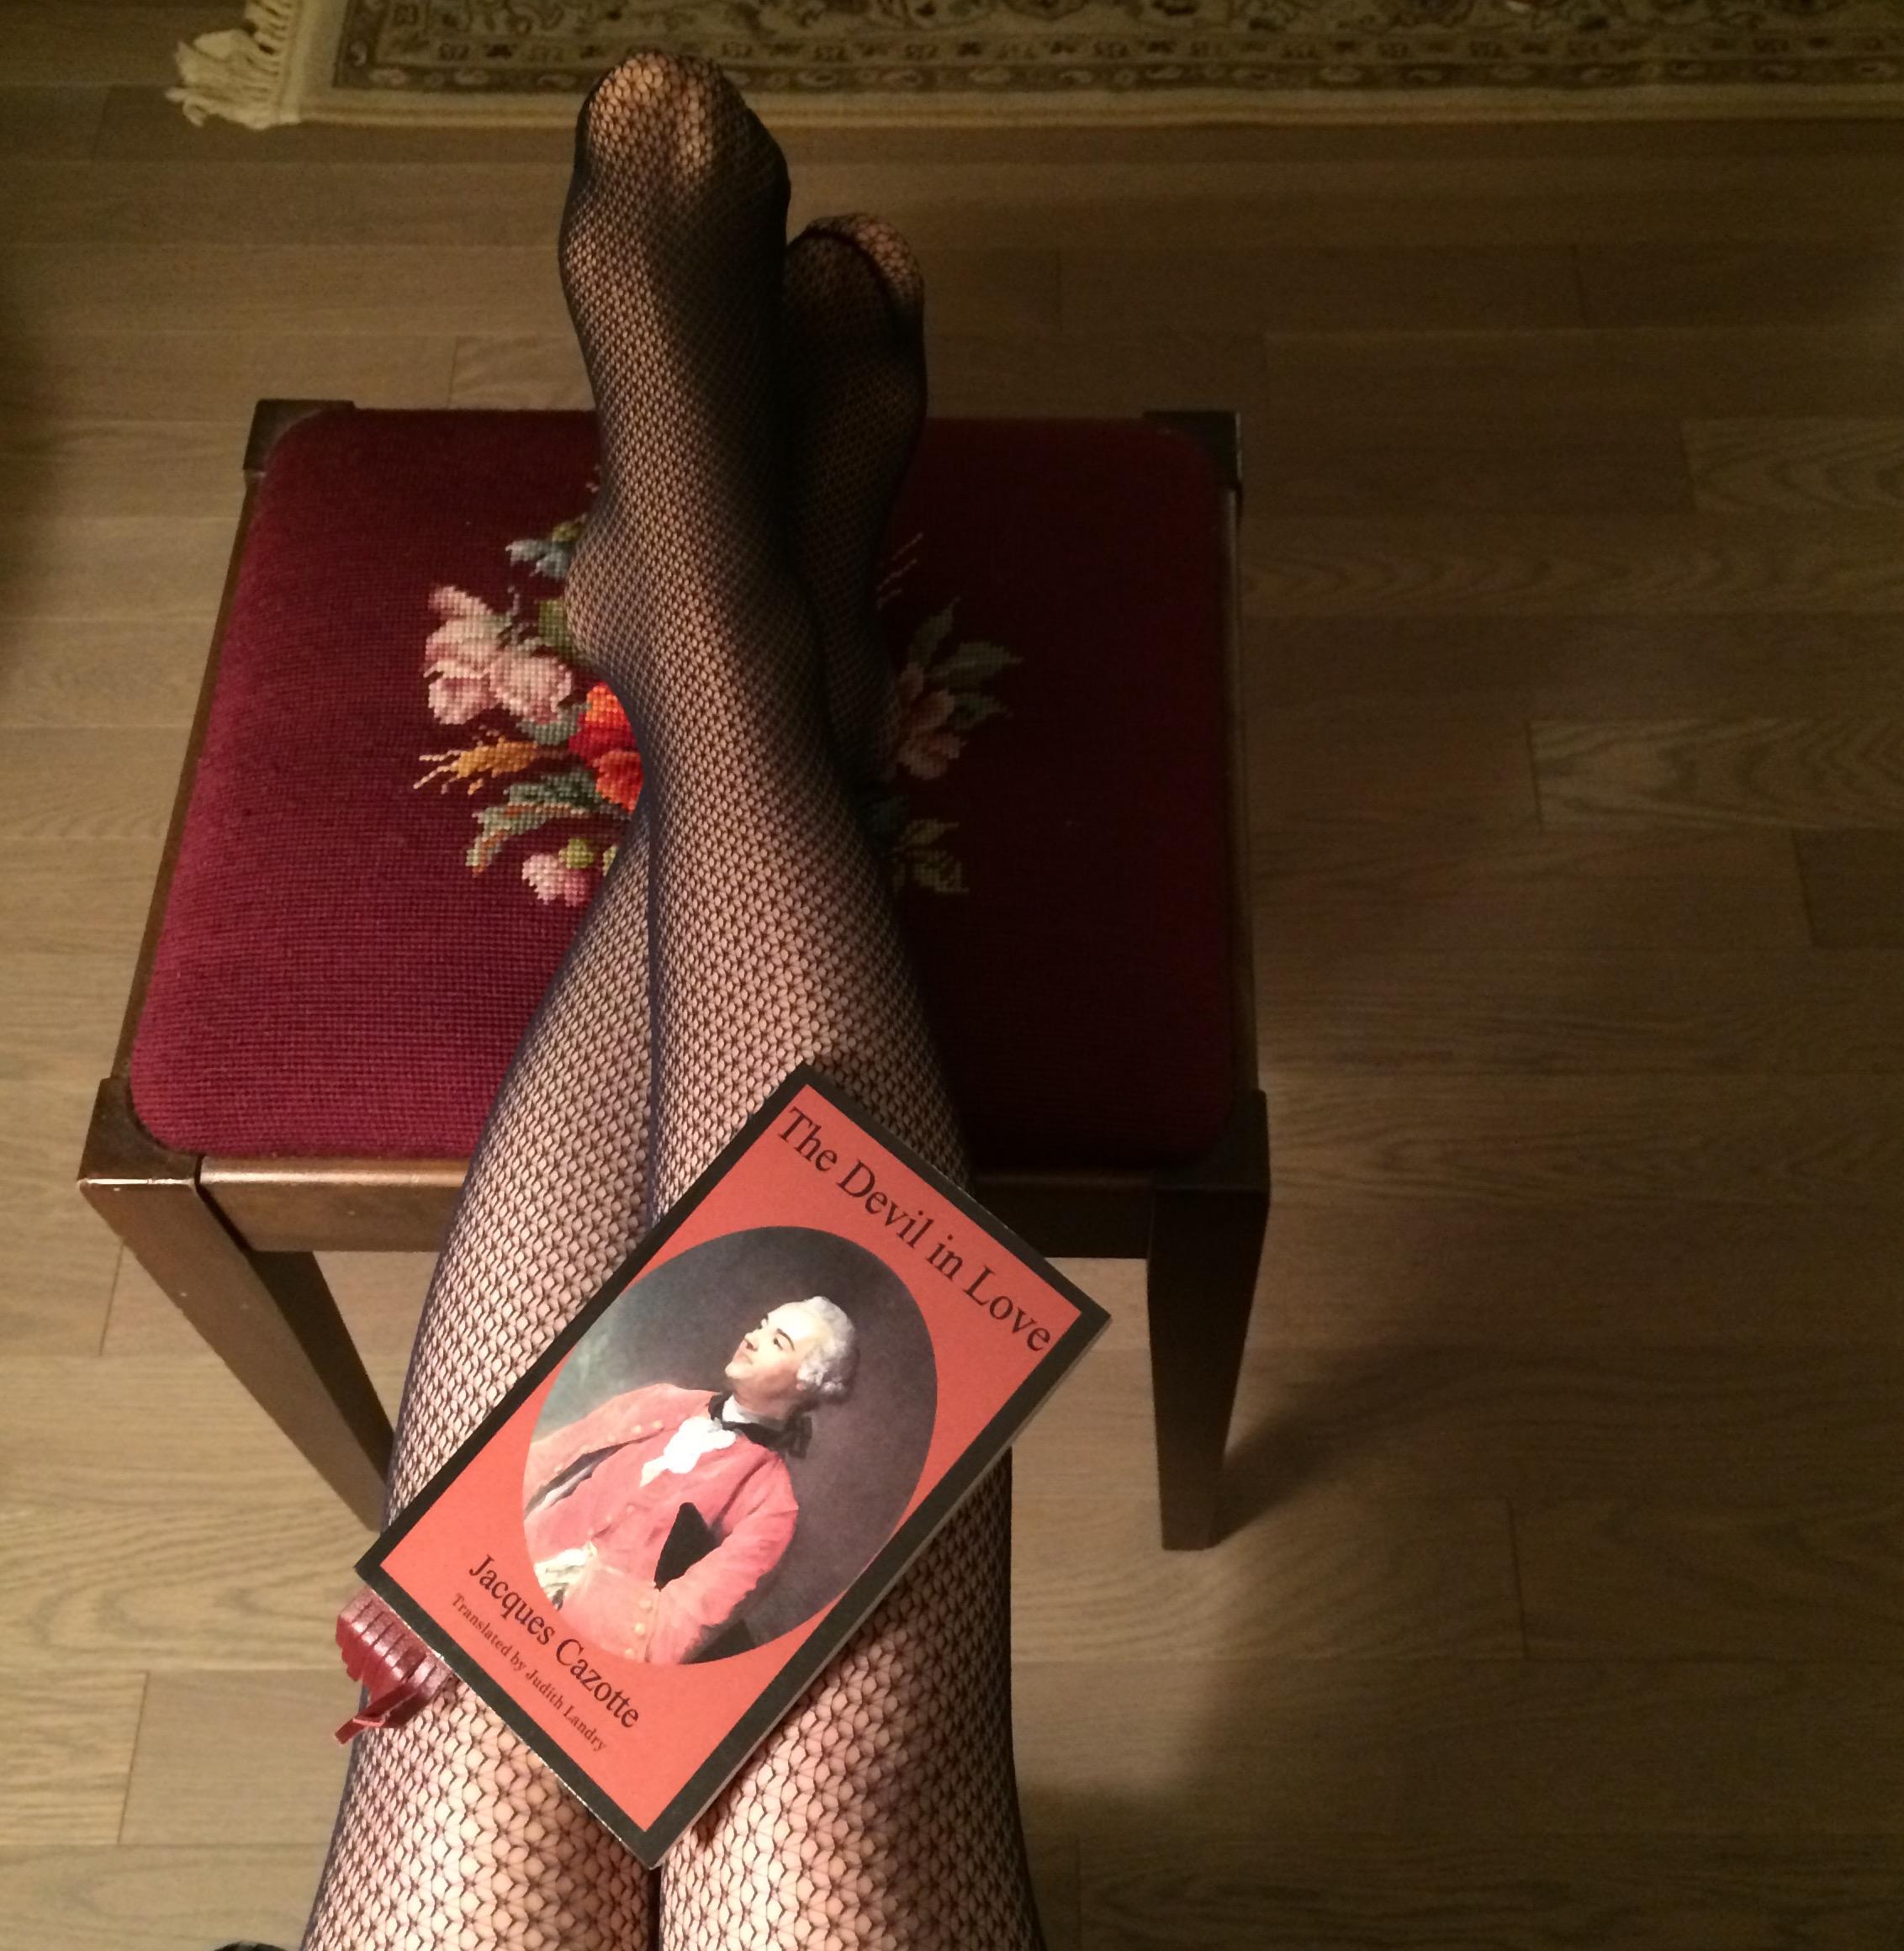 legs book reading